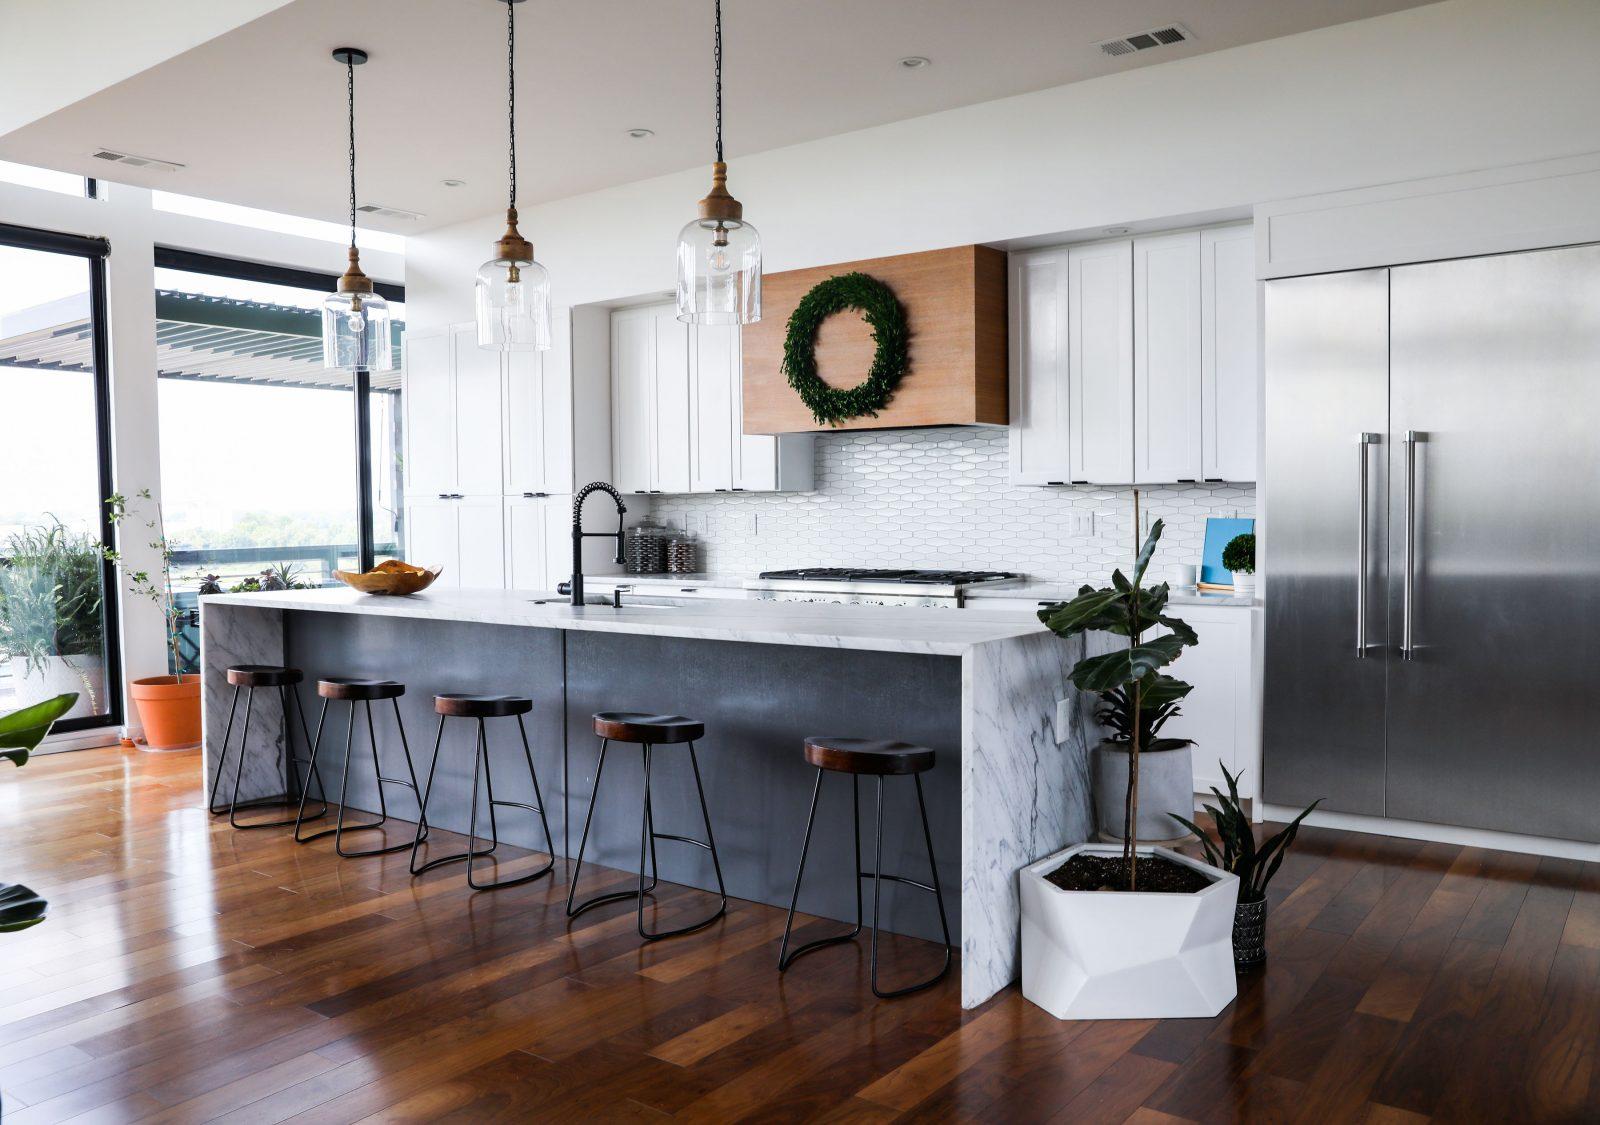 brooke and brice gilliam modern house in east nashville kitchen simple minimal white kitchen